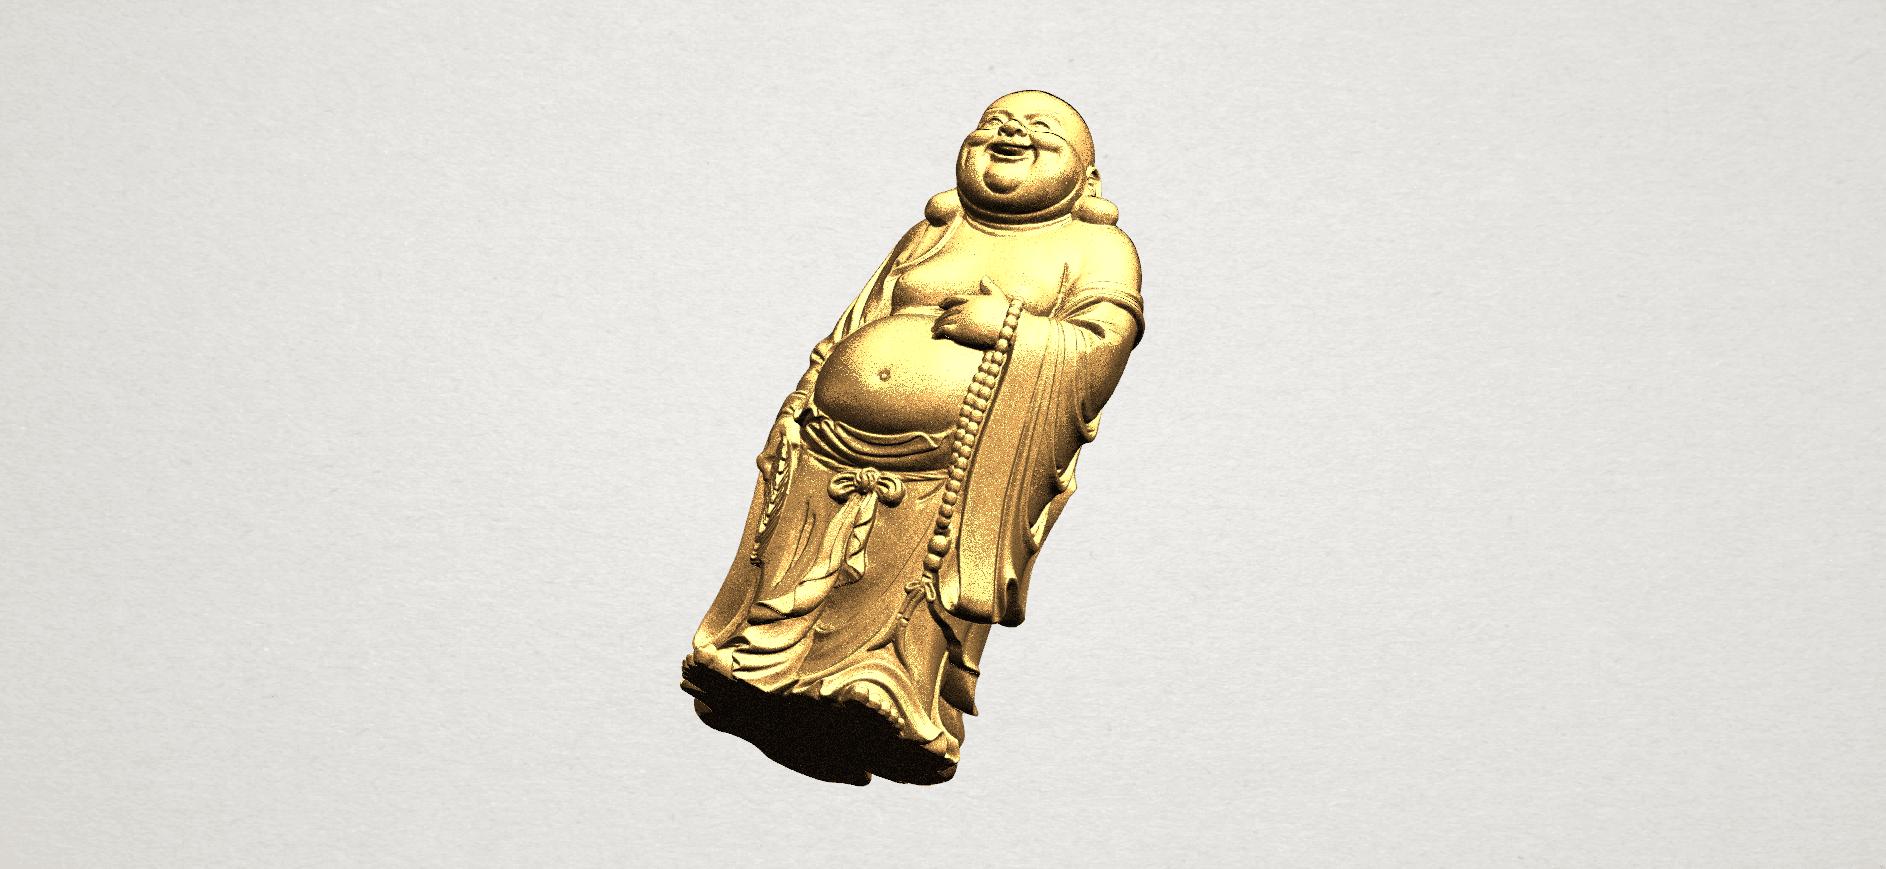 TDA0070 Metteyya Buddha 01 - 88mm - A06.png Download free STL file Metteyya Buddha 01 • 3D print object, GeorgesNikkei